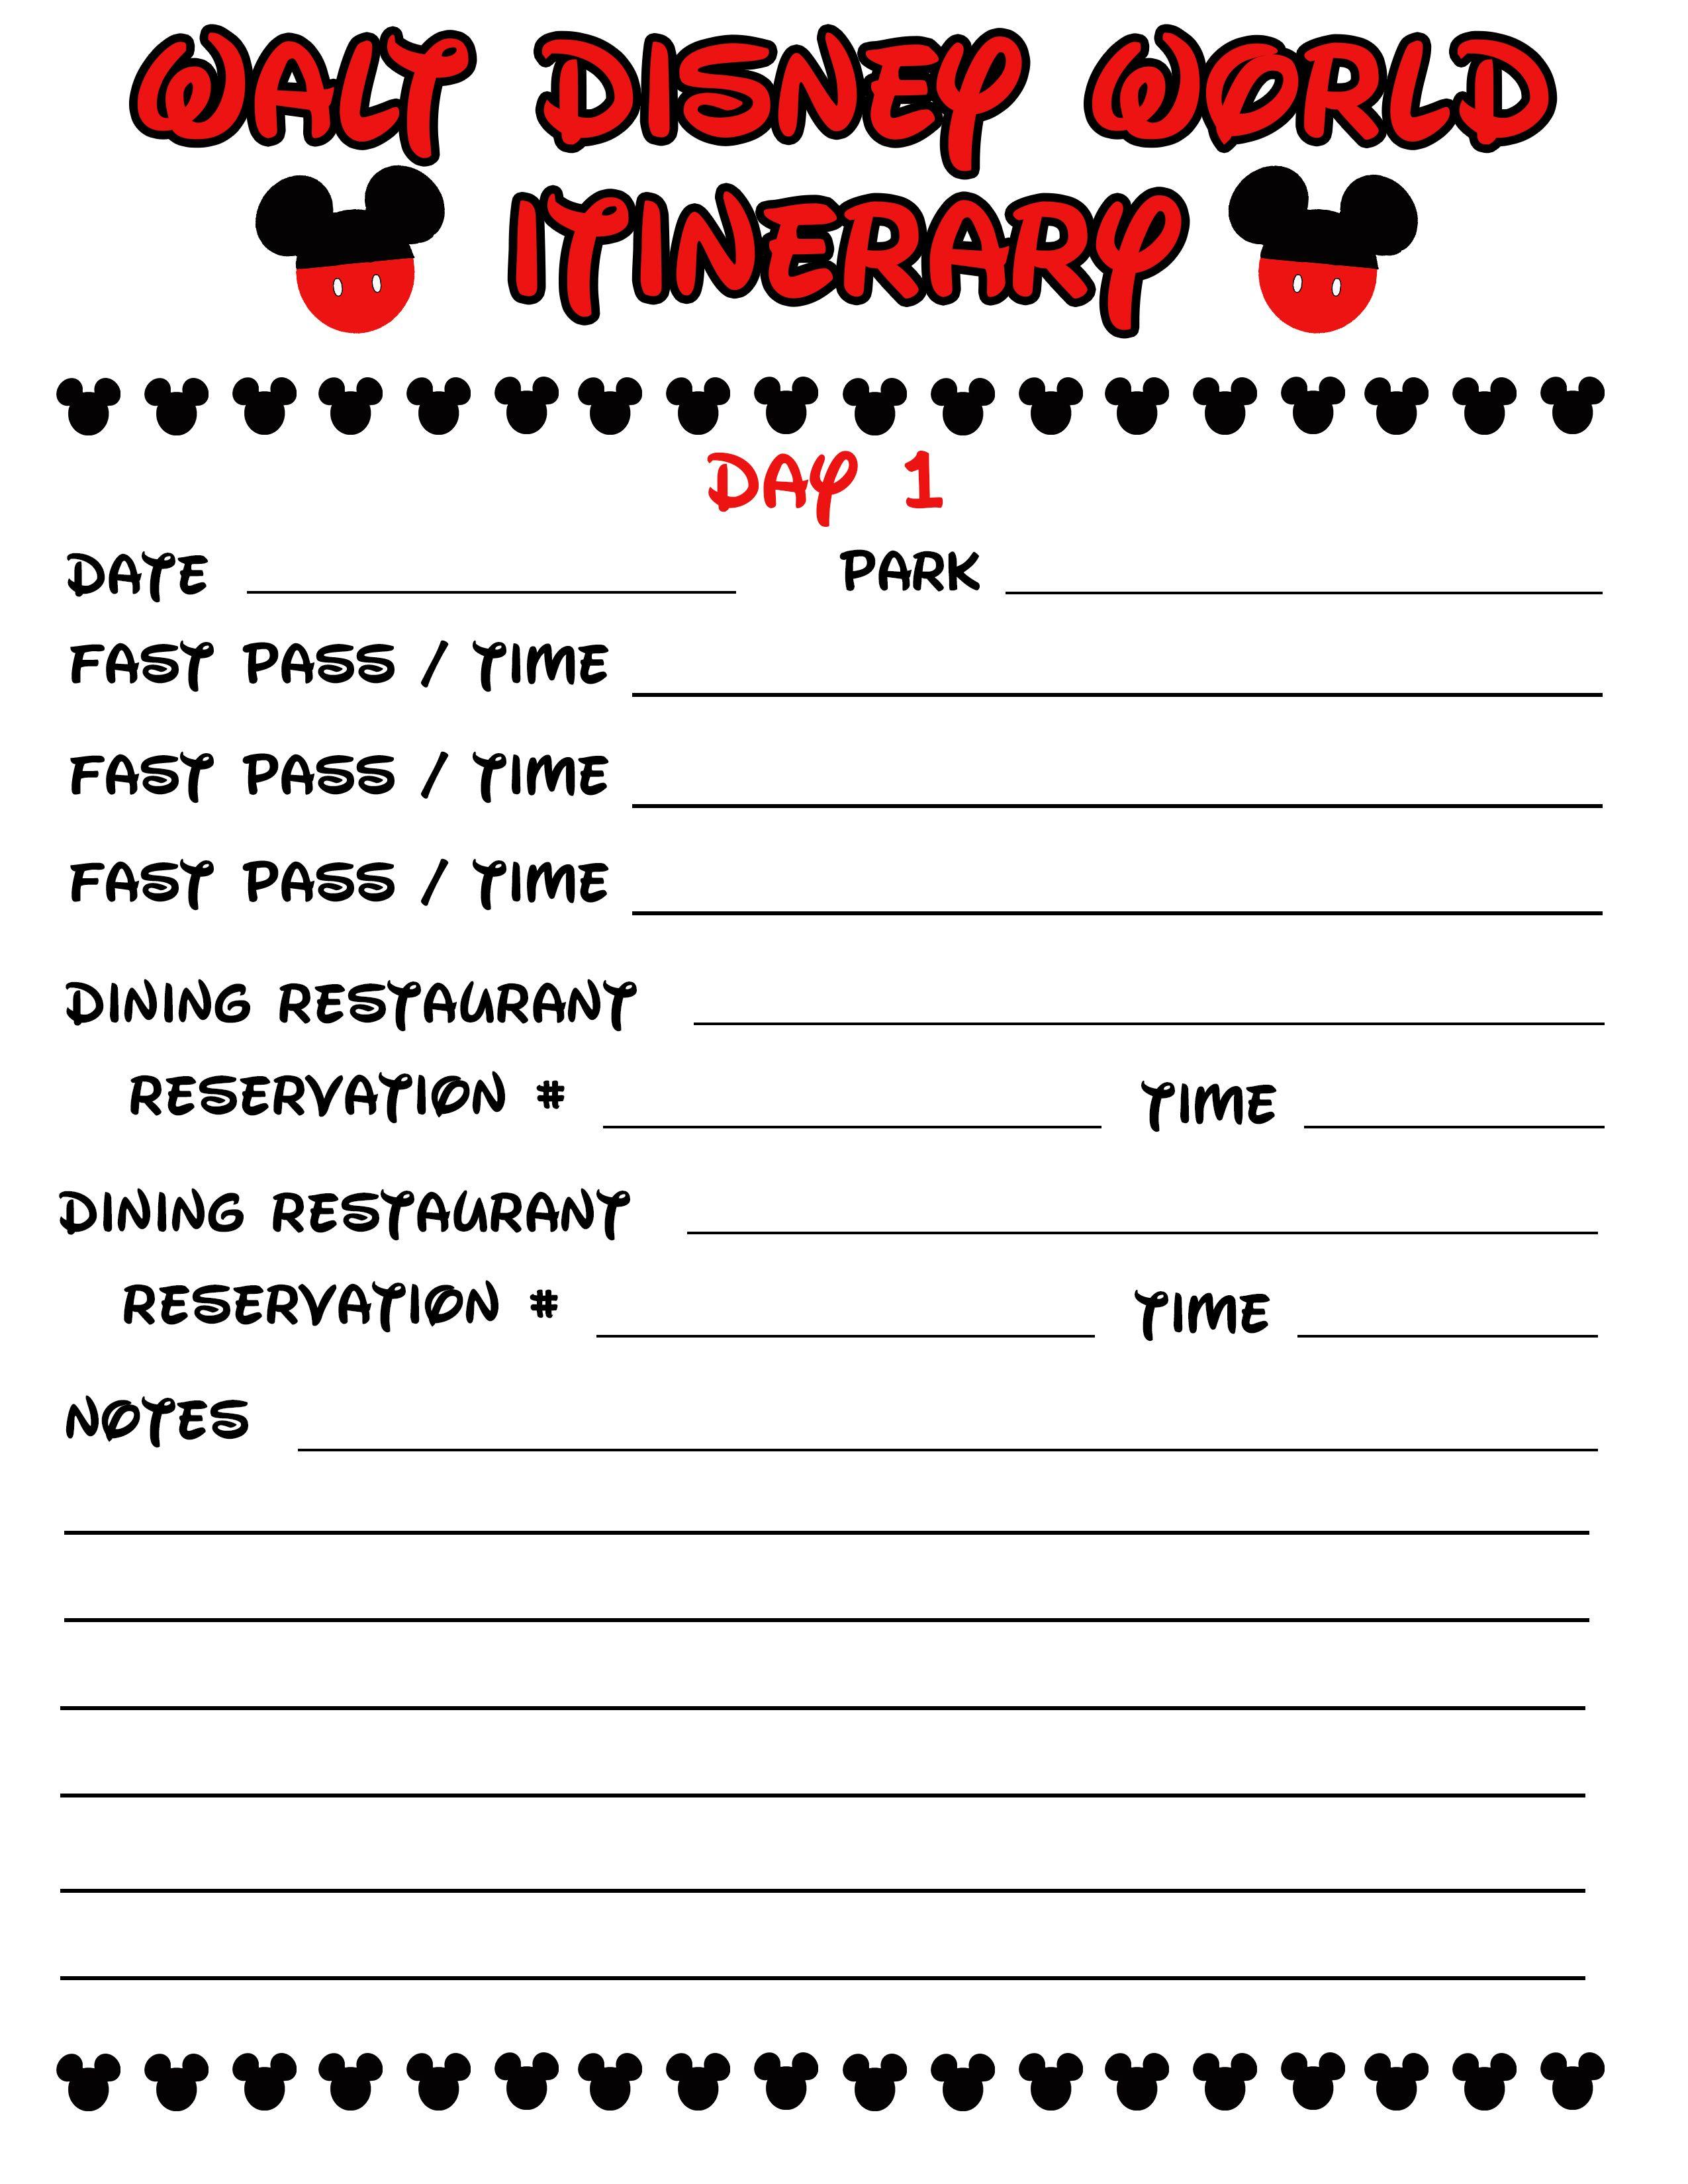 Disney Agenda & Itinerary Free Printable | Disney | Disney